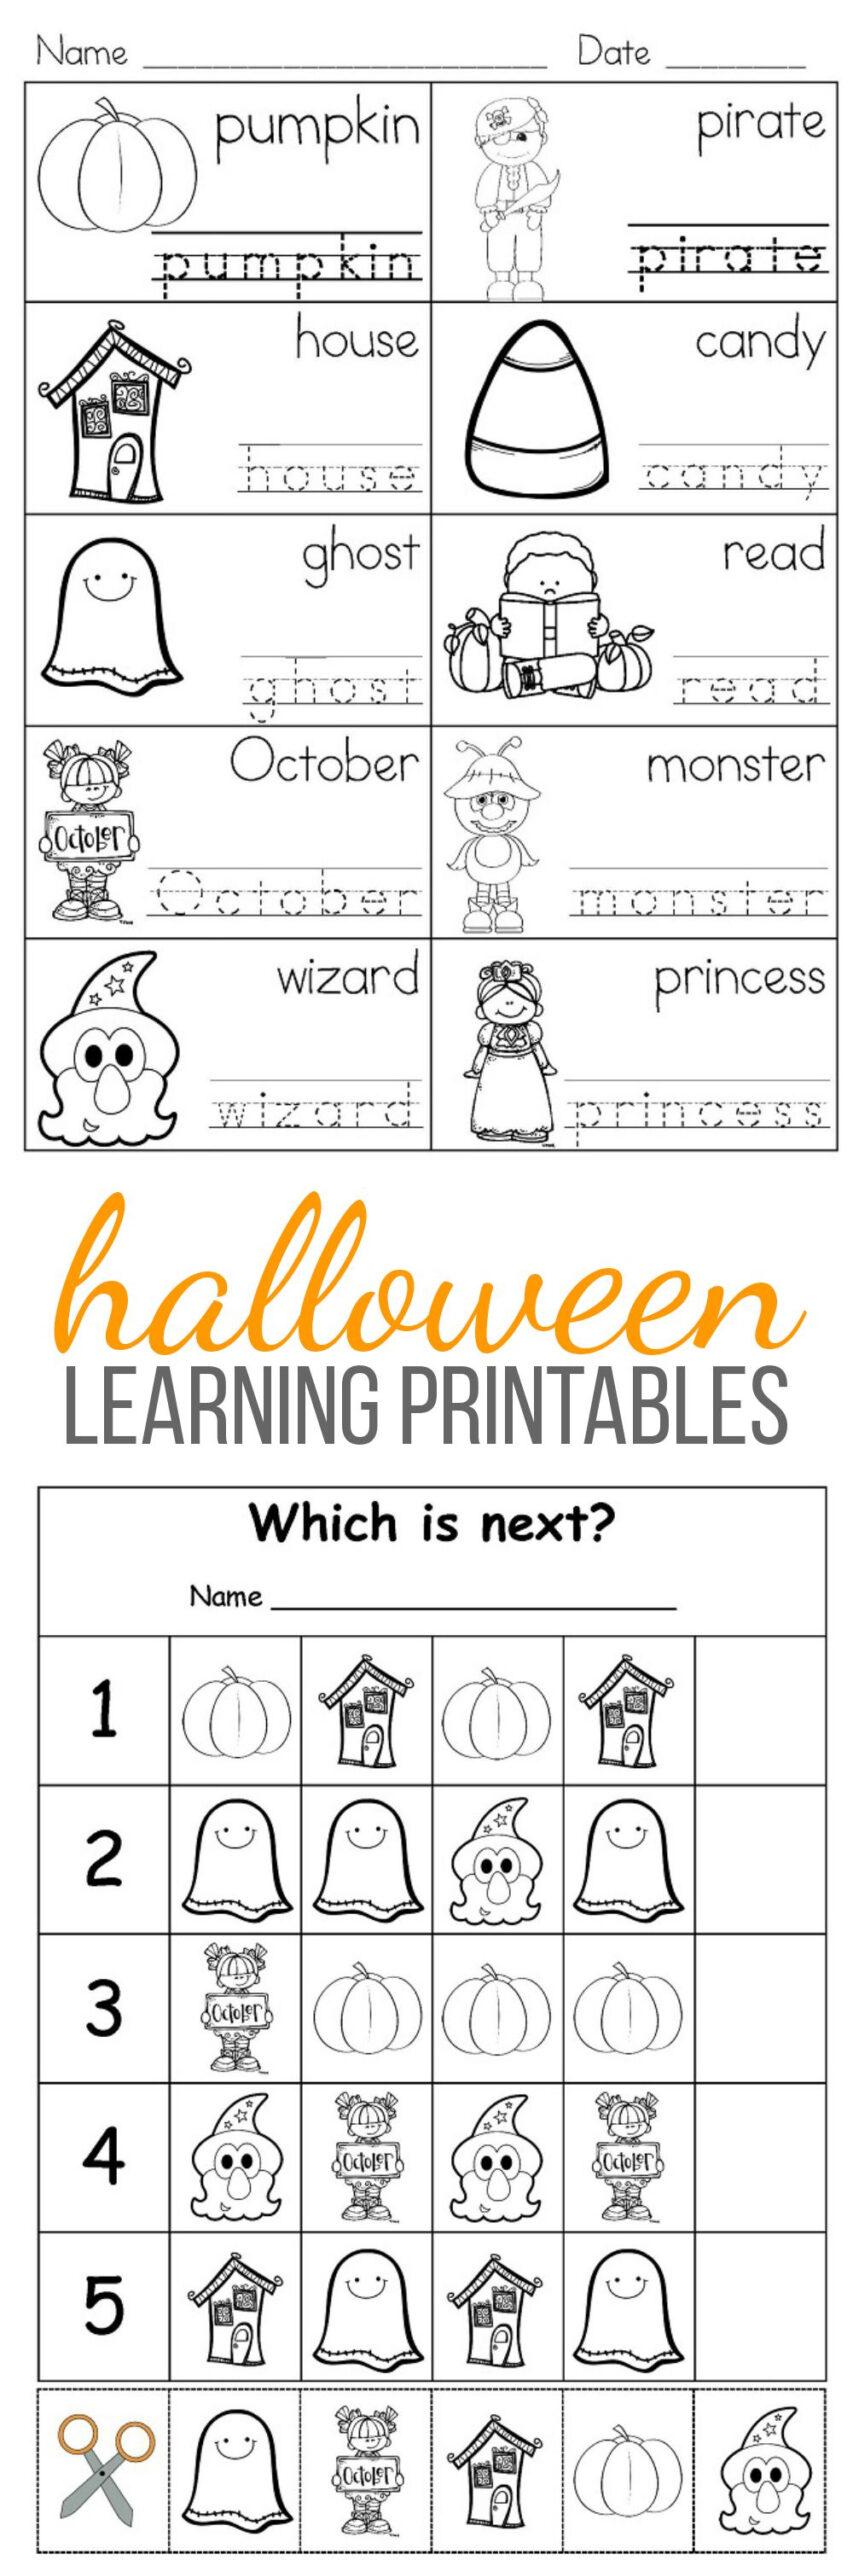 Halloween Fun Sheets